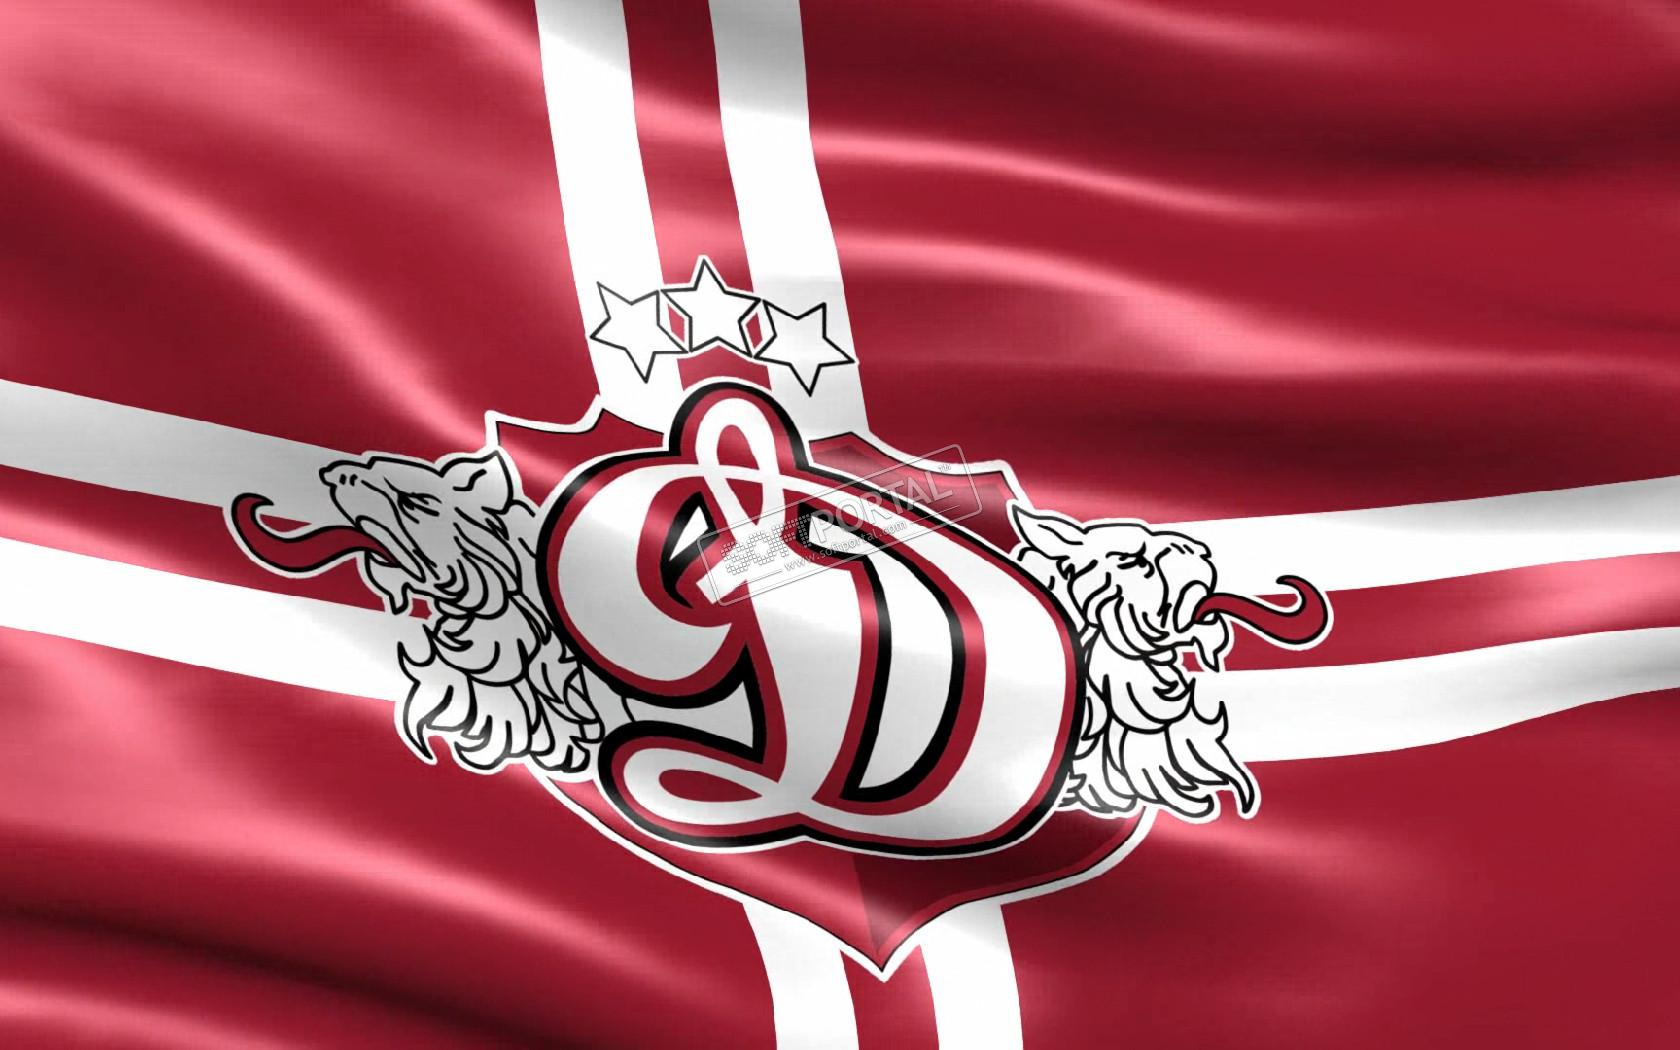 Динамо Рига 2016-2017